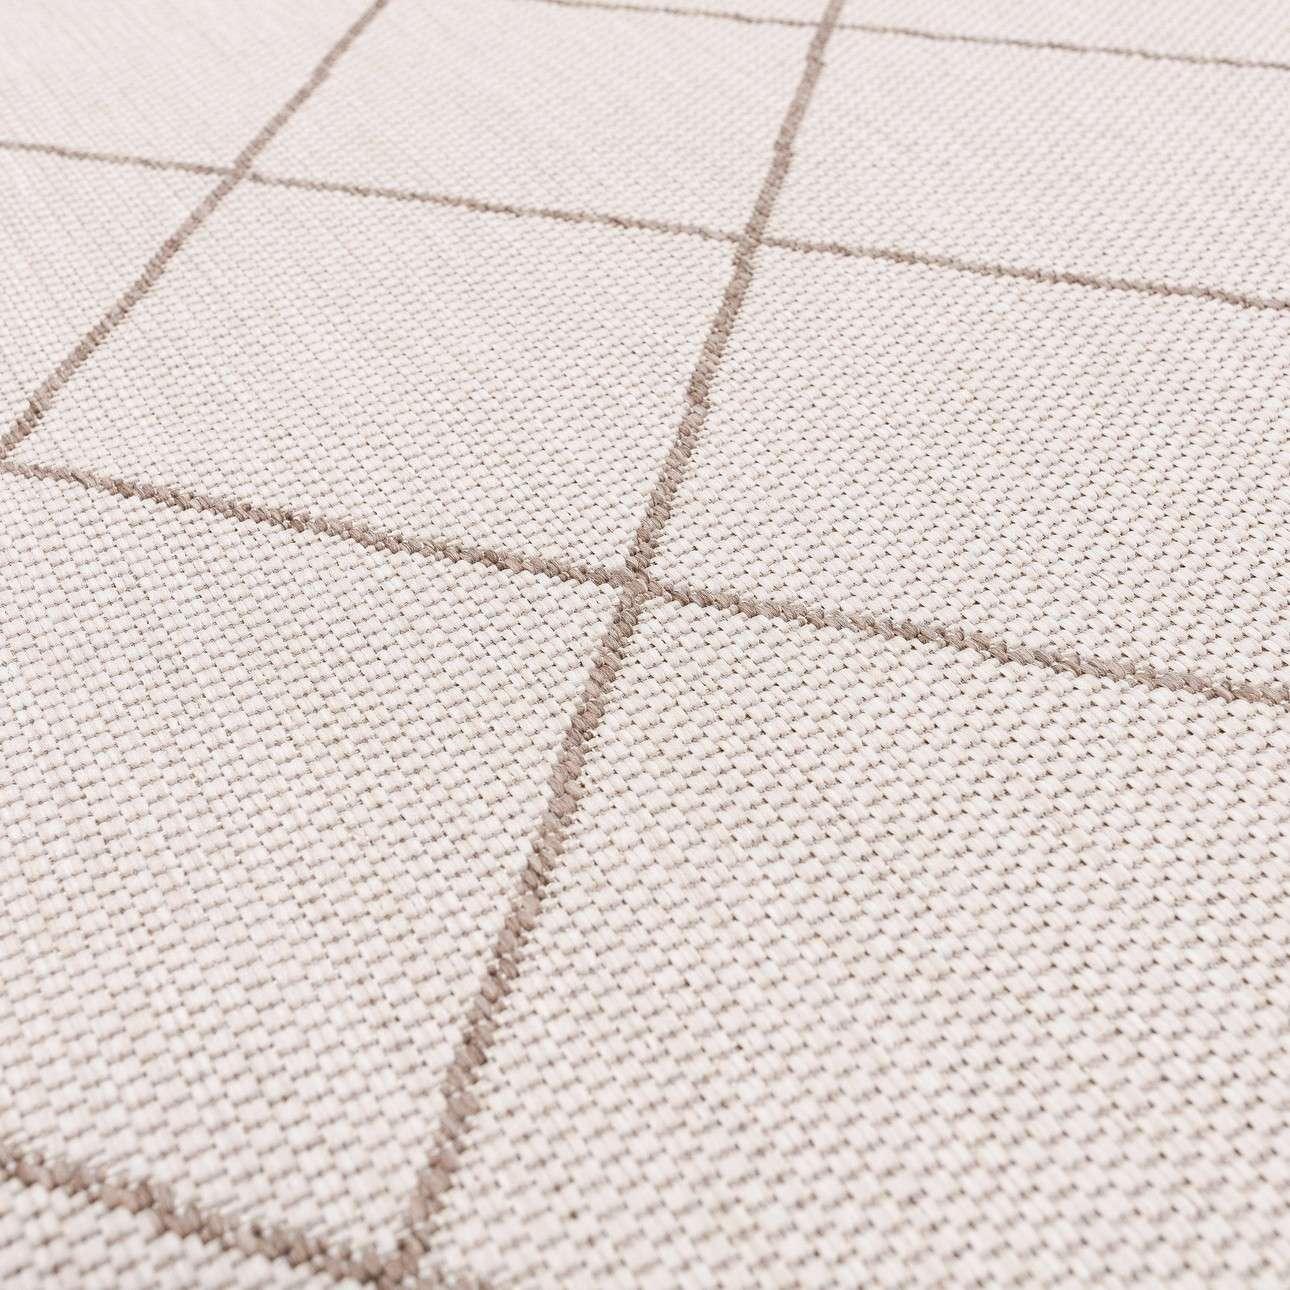 Dywan Lineo Rhombs wool/mink 120x170cm